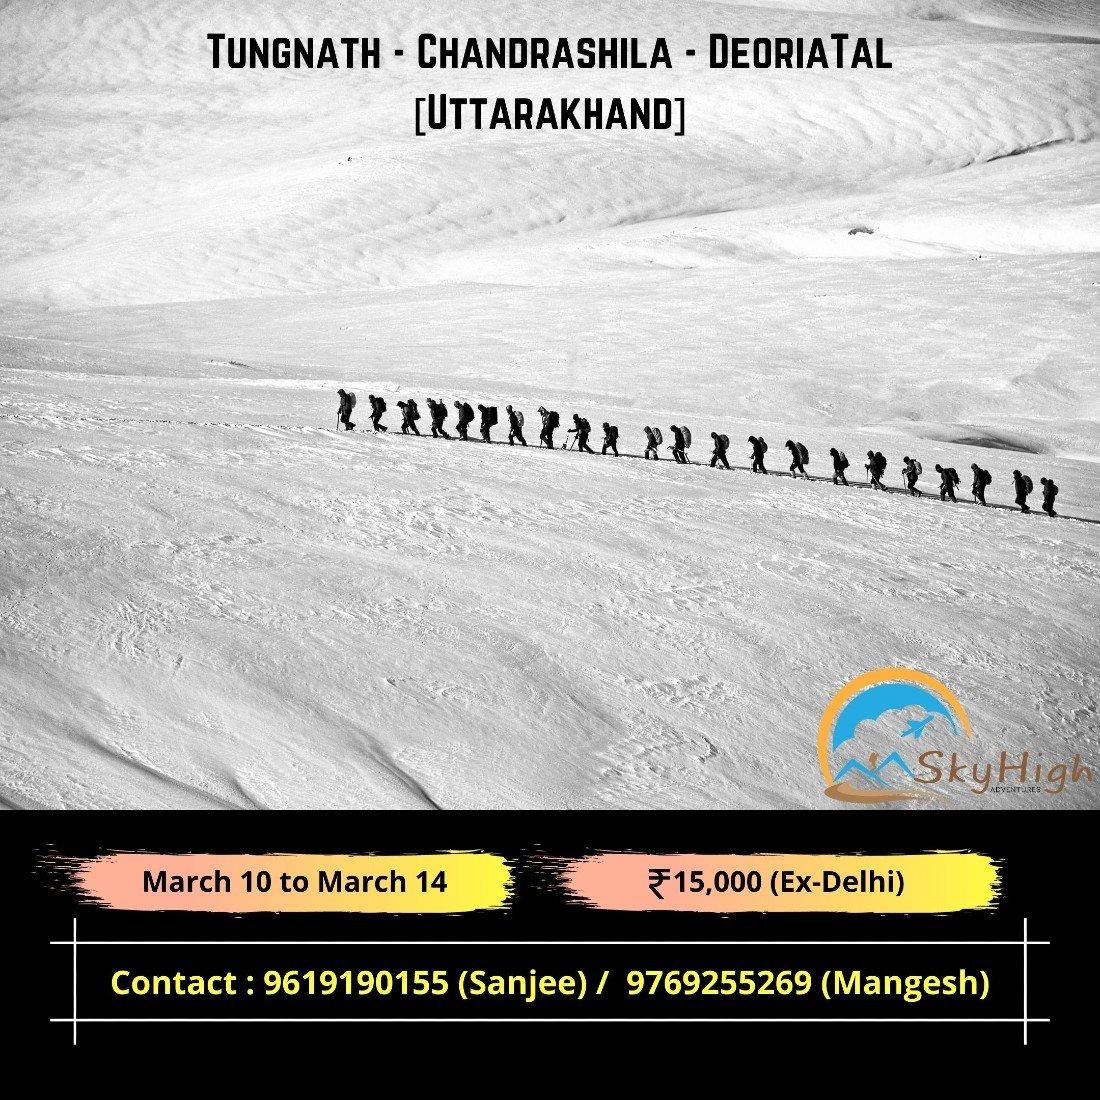 Snow Trek to Tungnath - Chandrashila - Deoriatal, 10 March | Event in Chopta | AllEvents.in